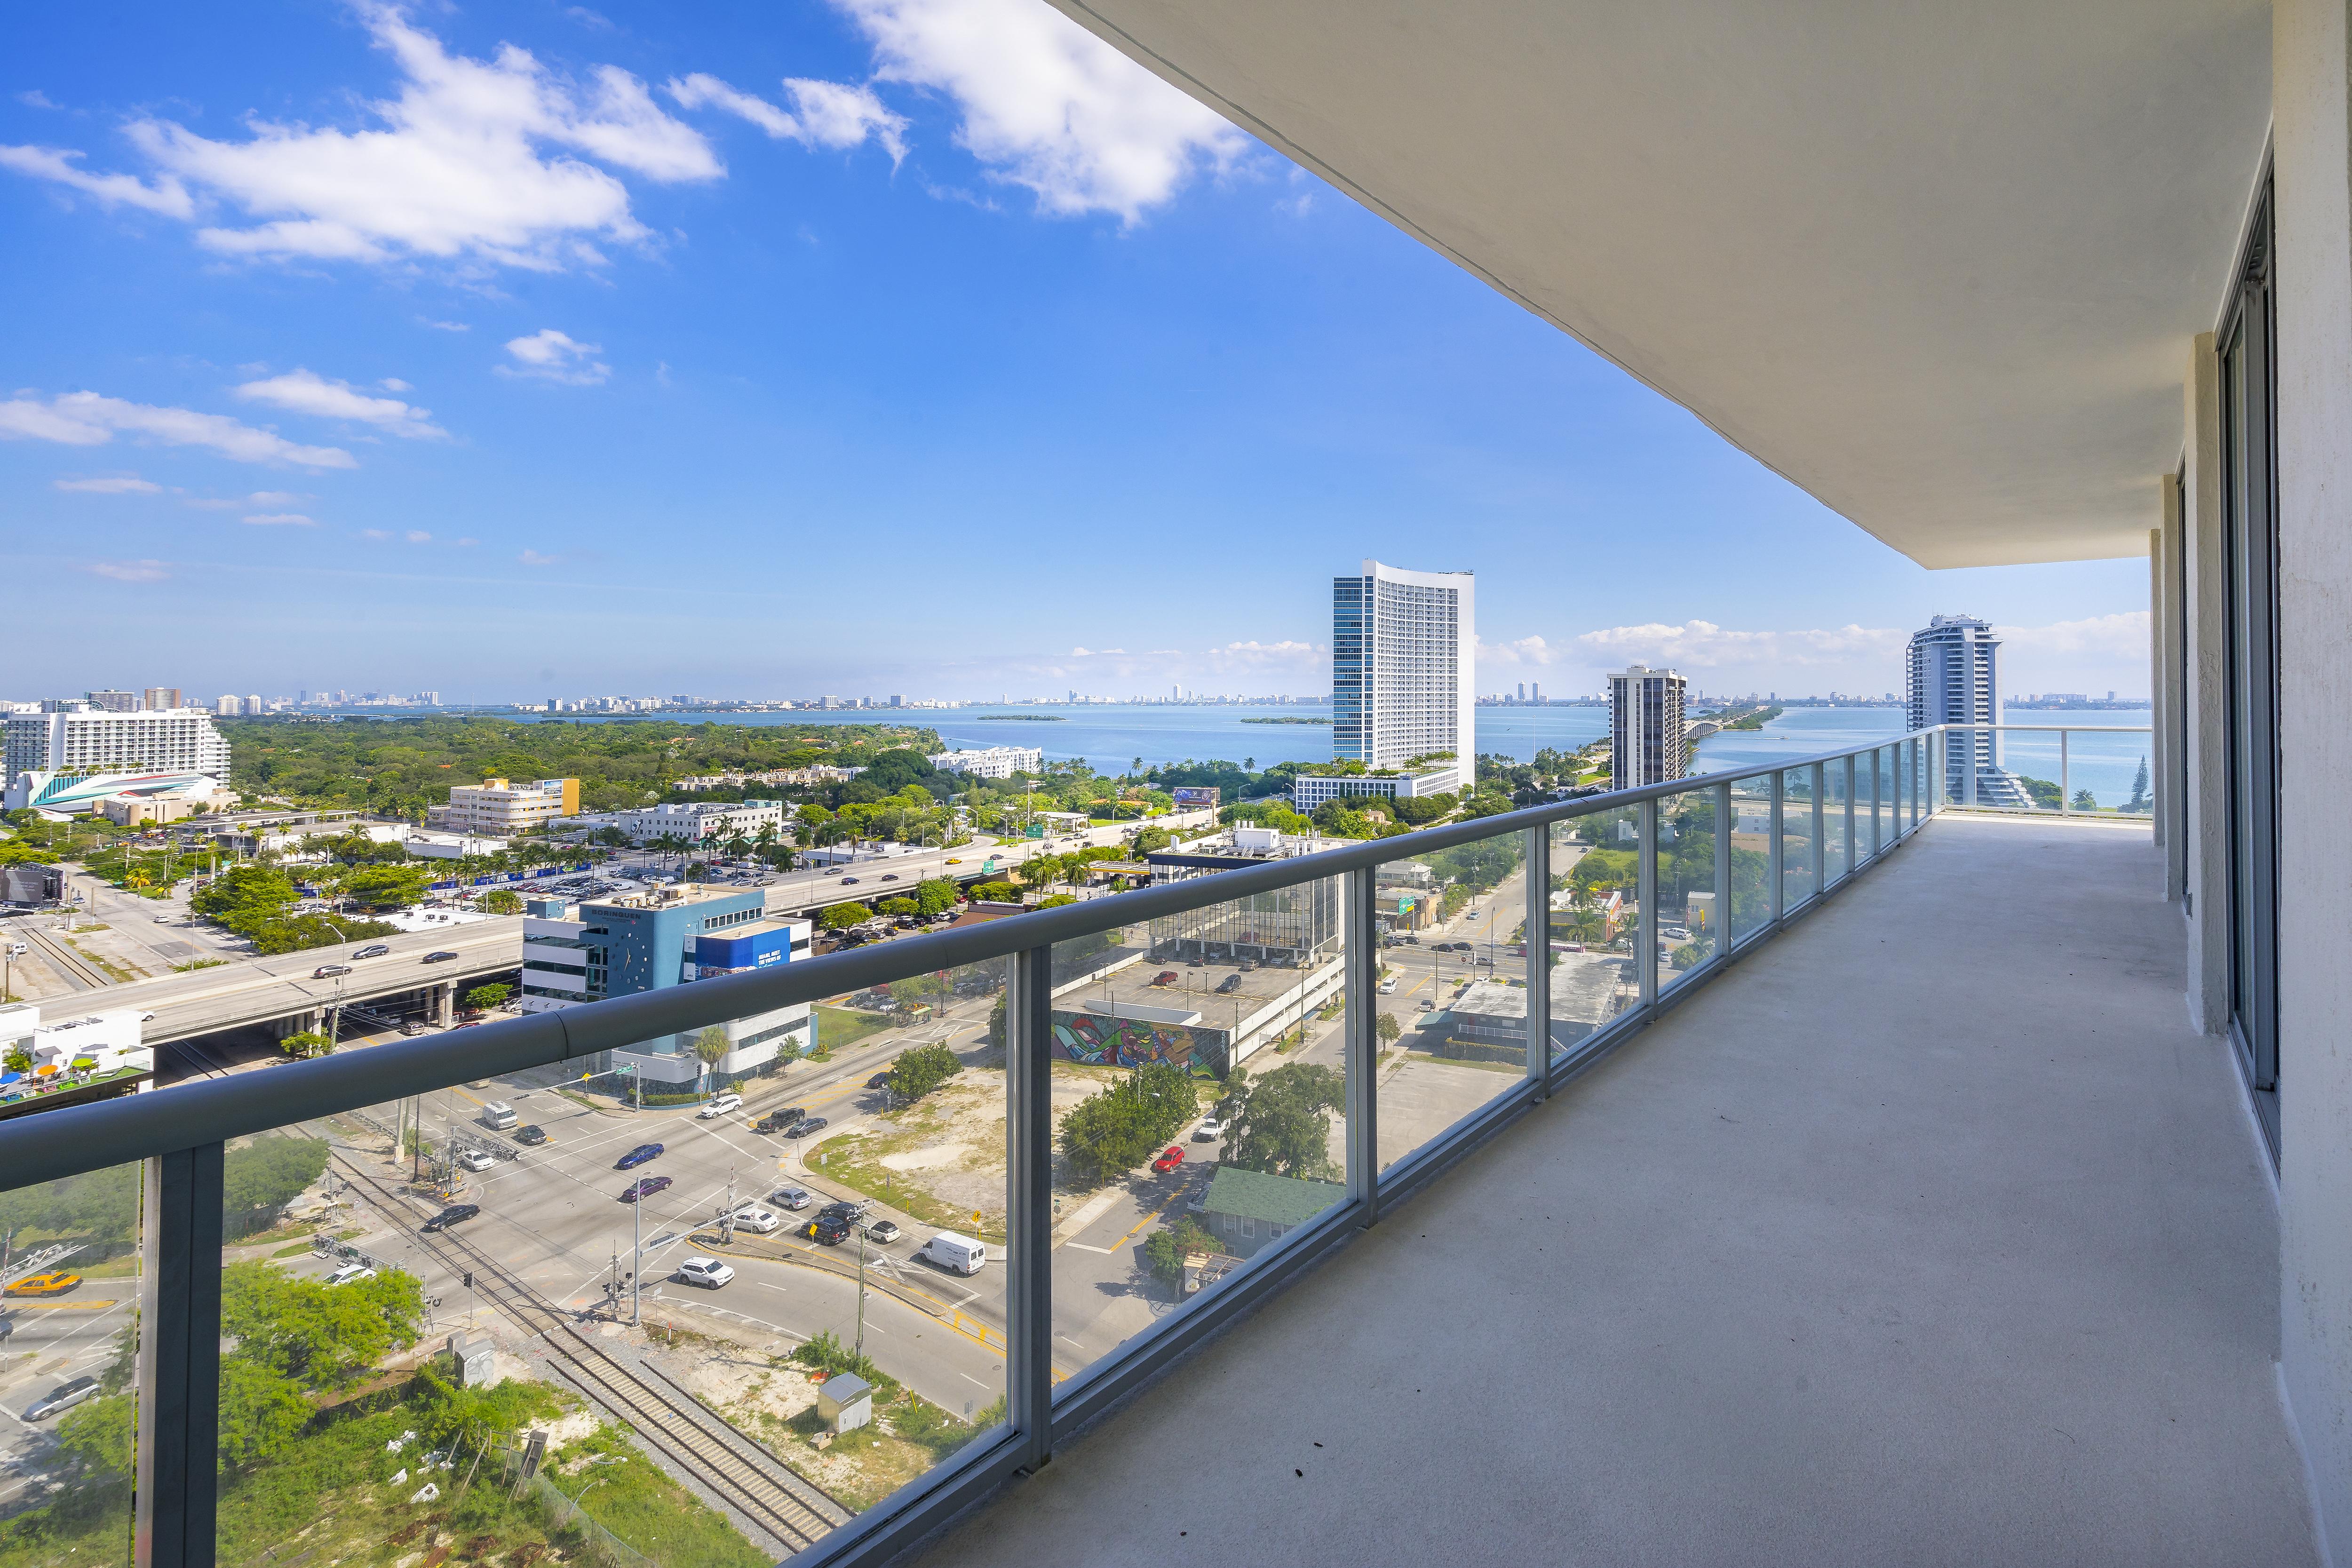 Condominium for Sale at 3470 E Coast Ave #H1701 3470 E Coast Ave H1701 Miami, Florida, 33137 United States